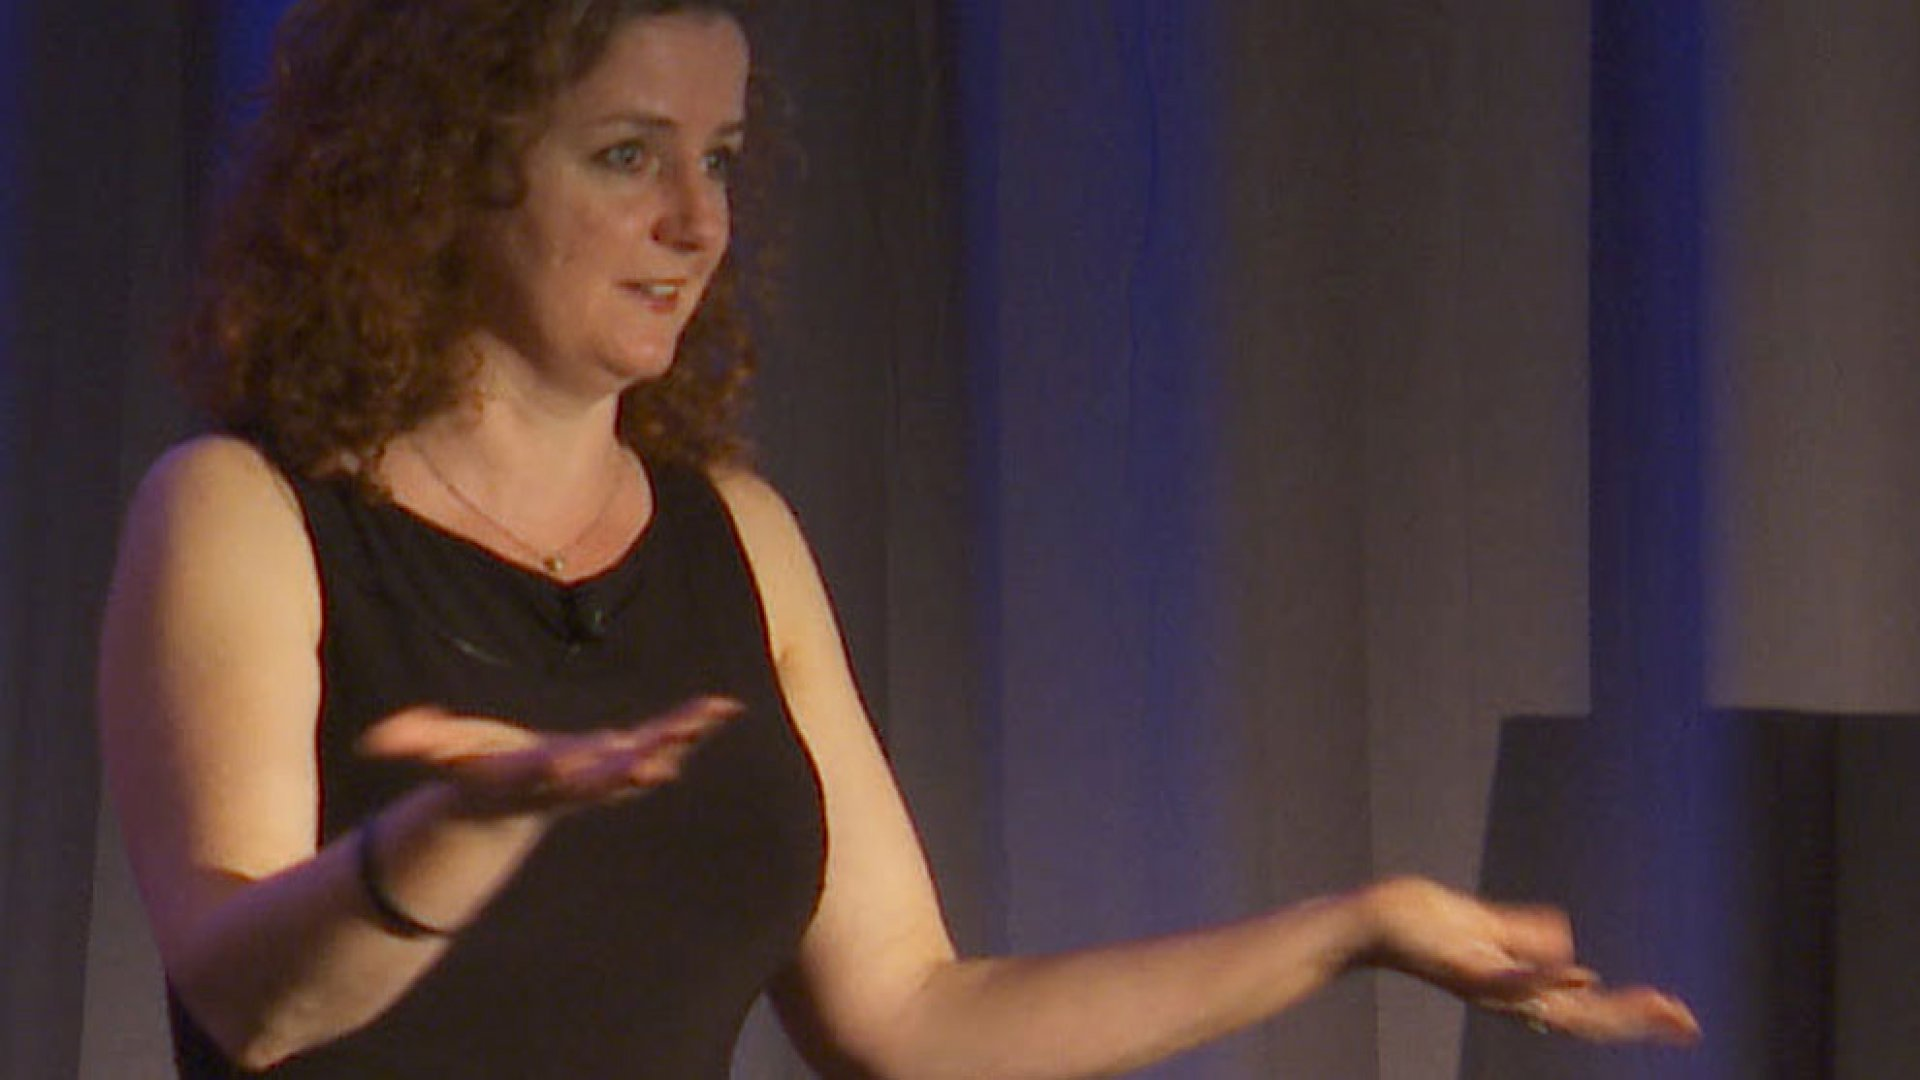 Laura Fitton: Mastering Social Media for Business